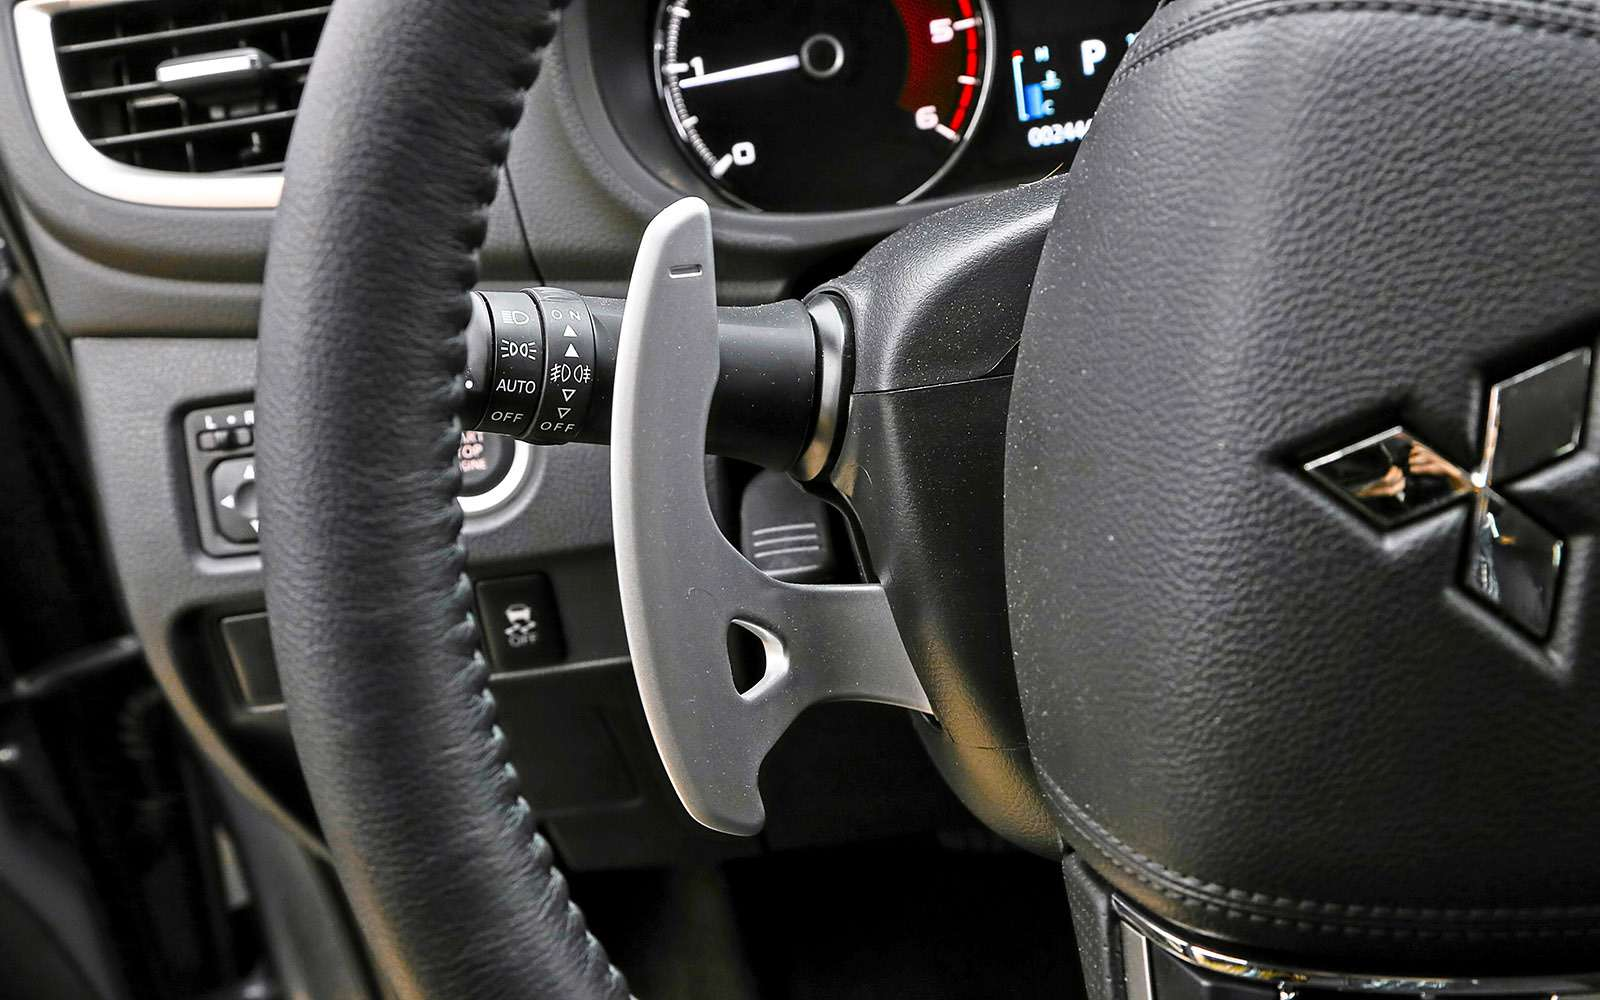 Mitsubishi Pajero Sport иKia Mohave— сравнительный тест настоящих внедорожников— фото 769872